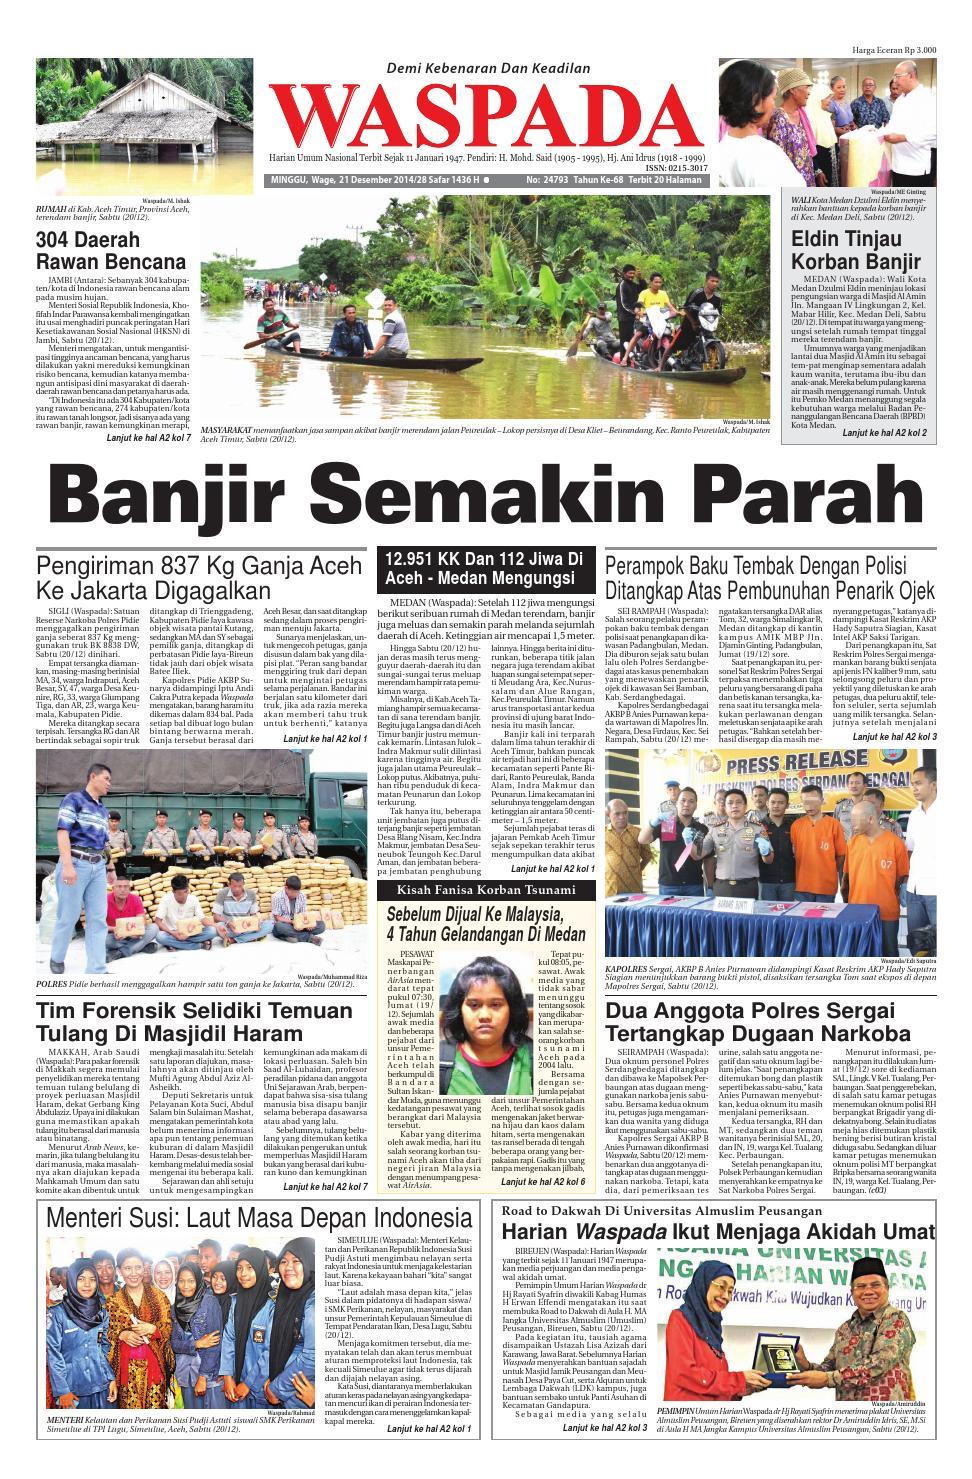 Waspada Minggu 21 Desember 2014 By Harian Issuu Zaskia Mecca Illea Blouse Perak